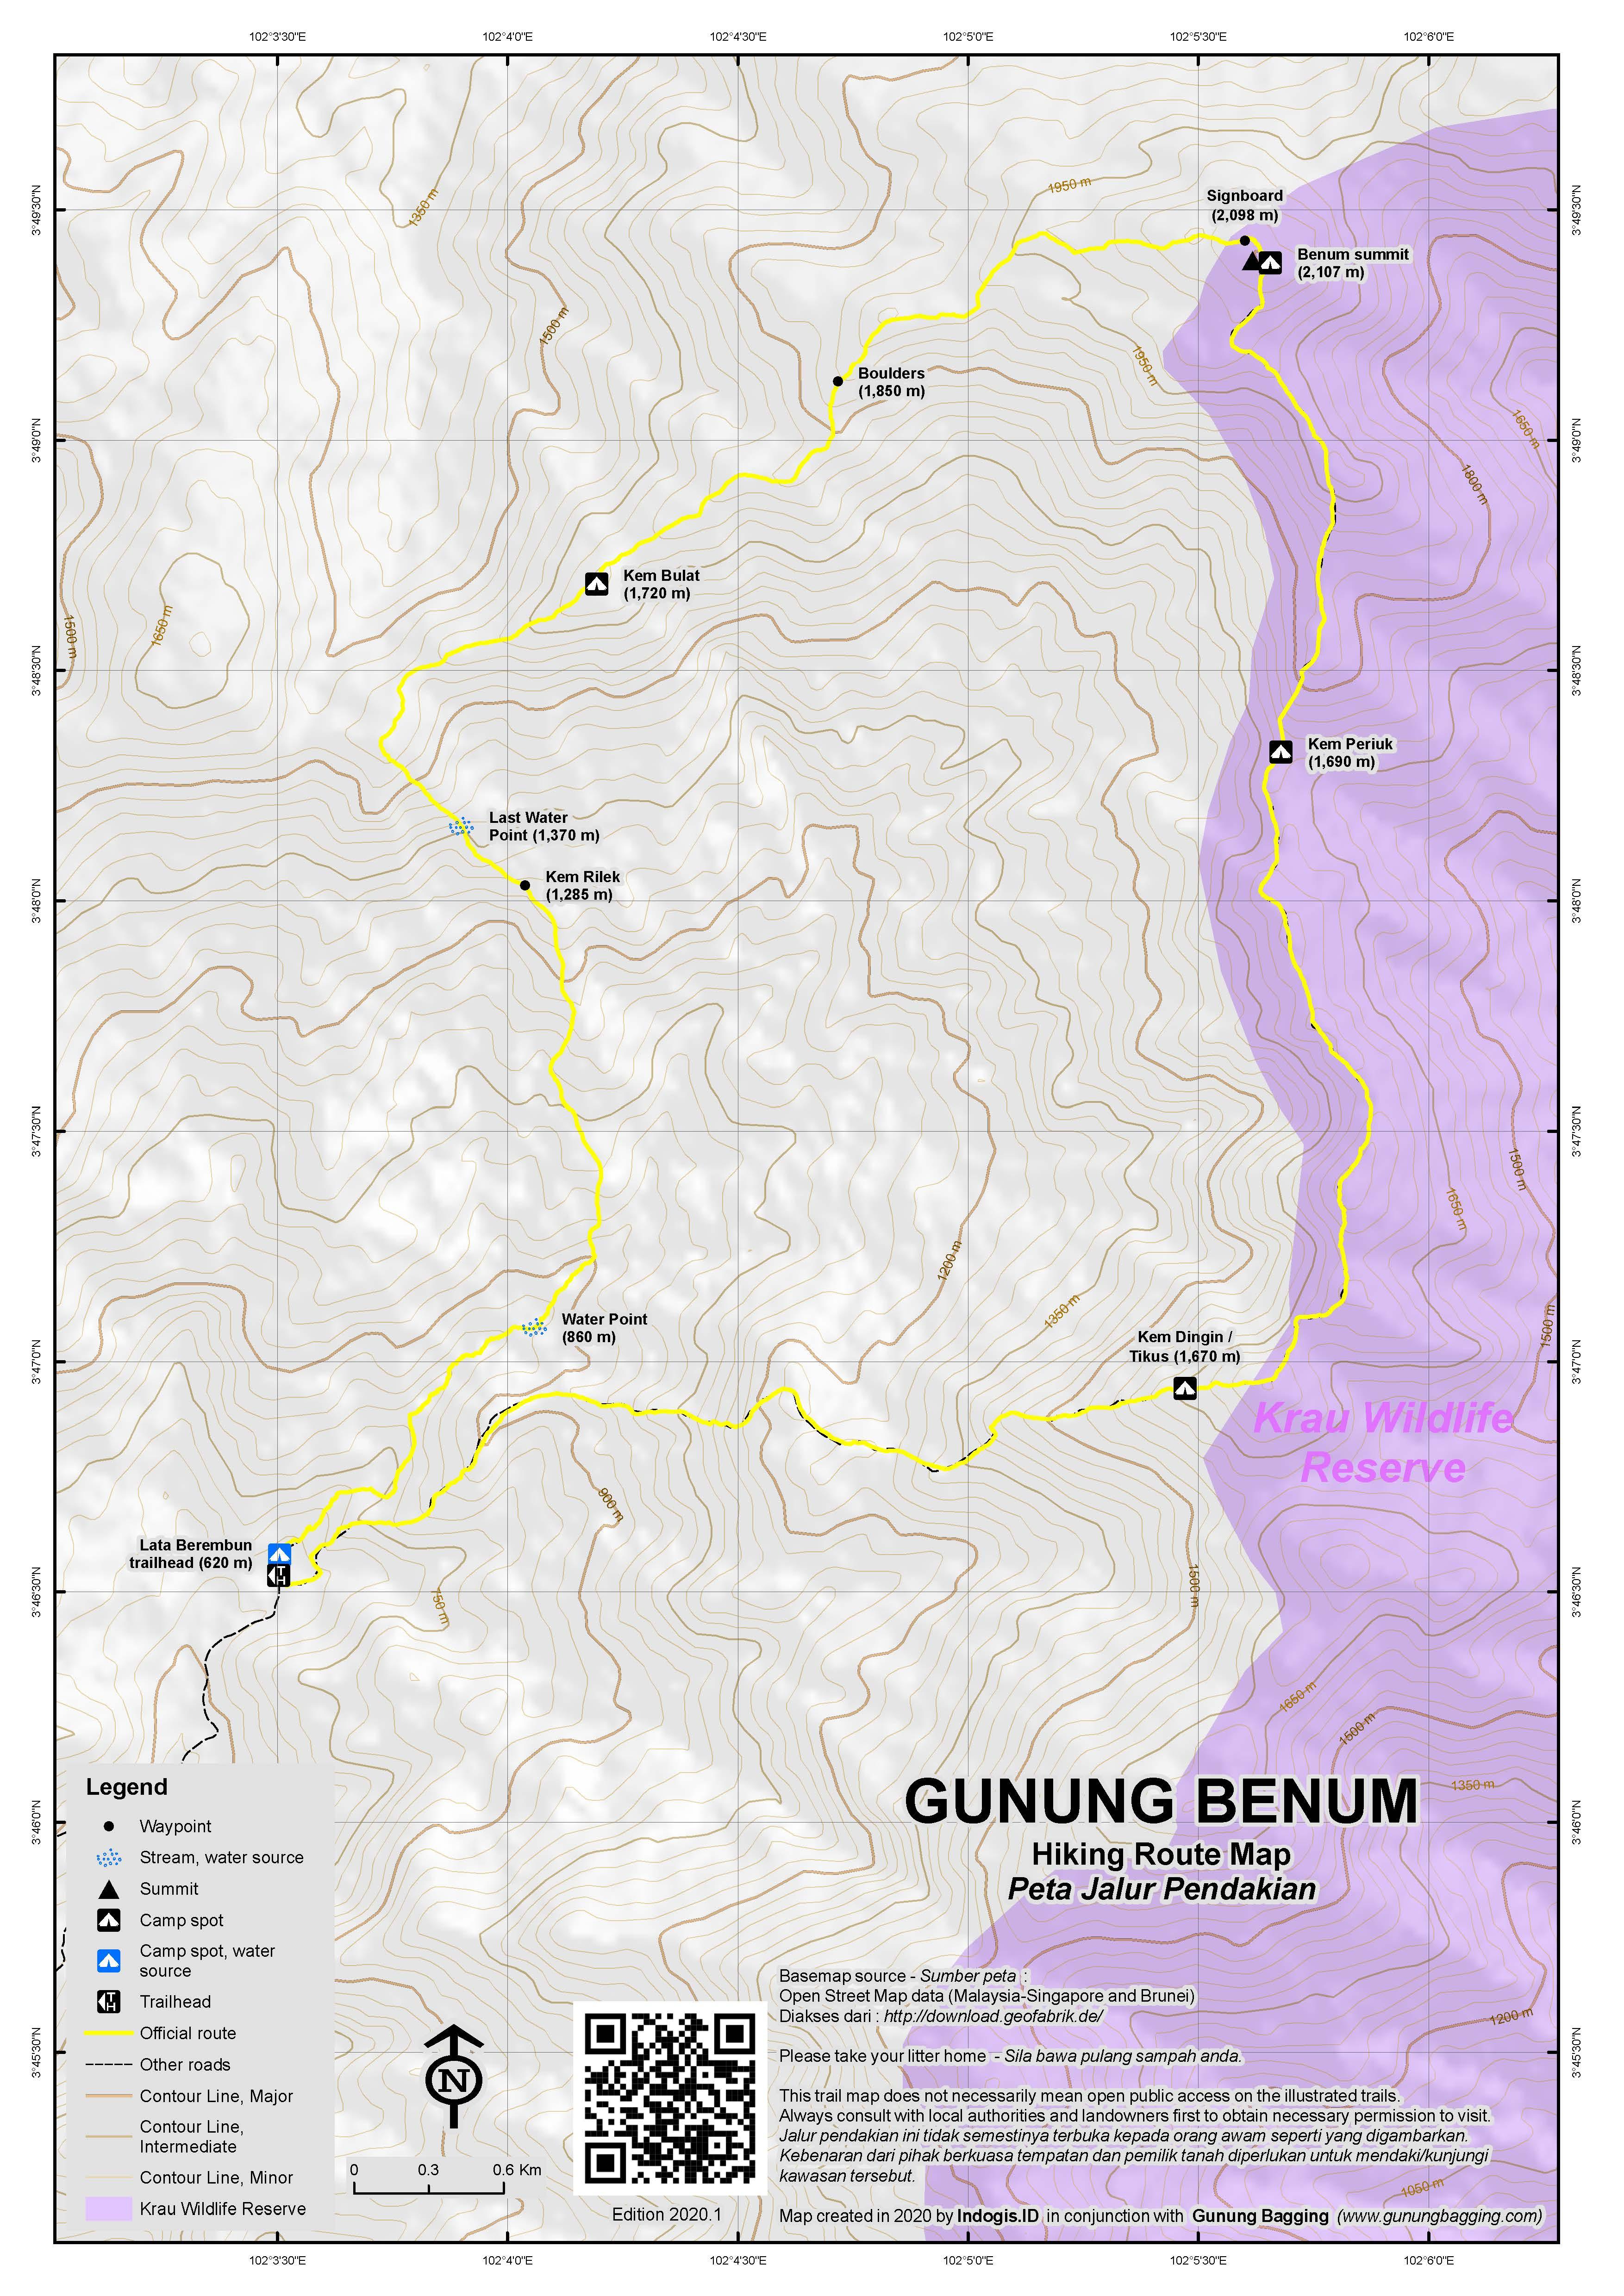 Peta Jalur Pendakian Gunung Benum